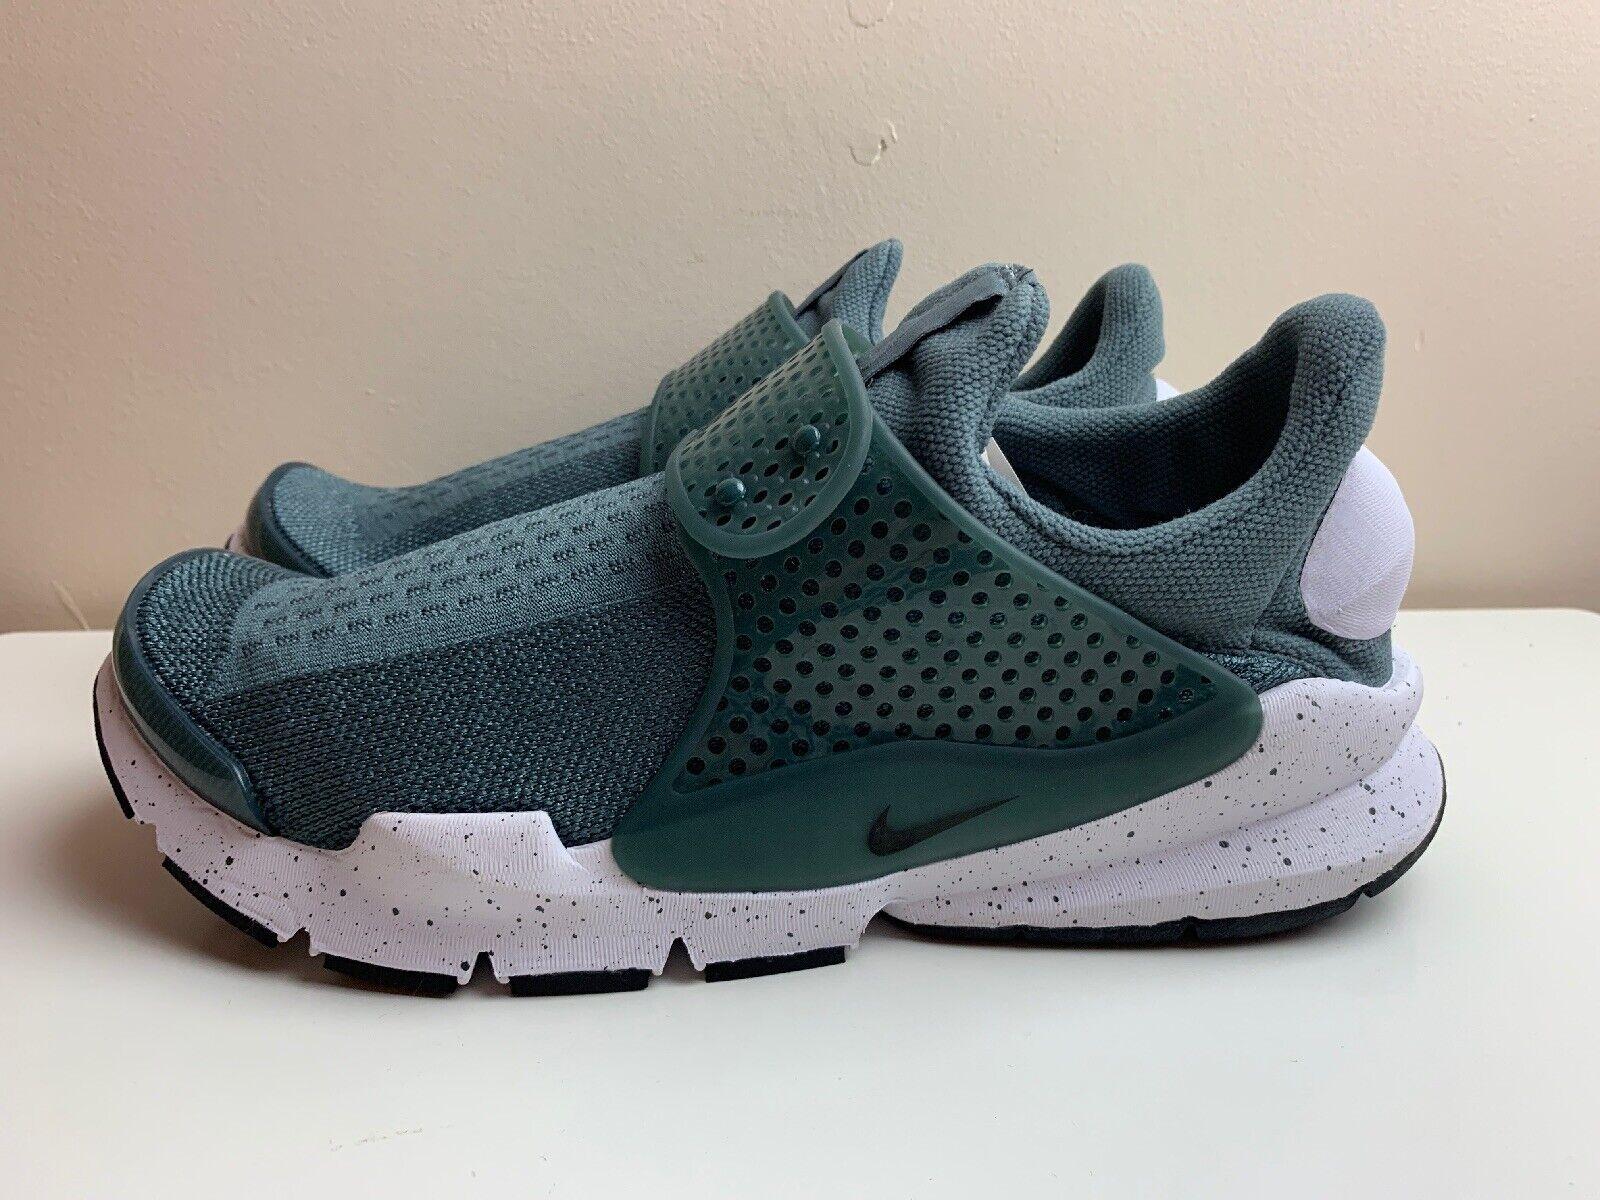 Nike Sock Dart se paniers Homme Vert Olive Blanc UK 8 EUR 42.5 833124 302